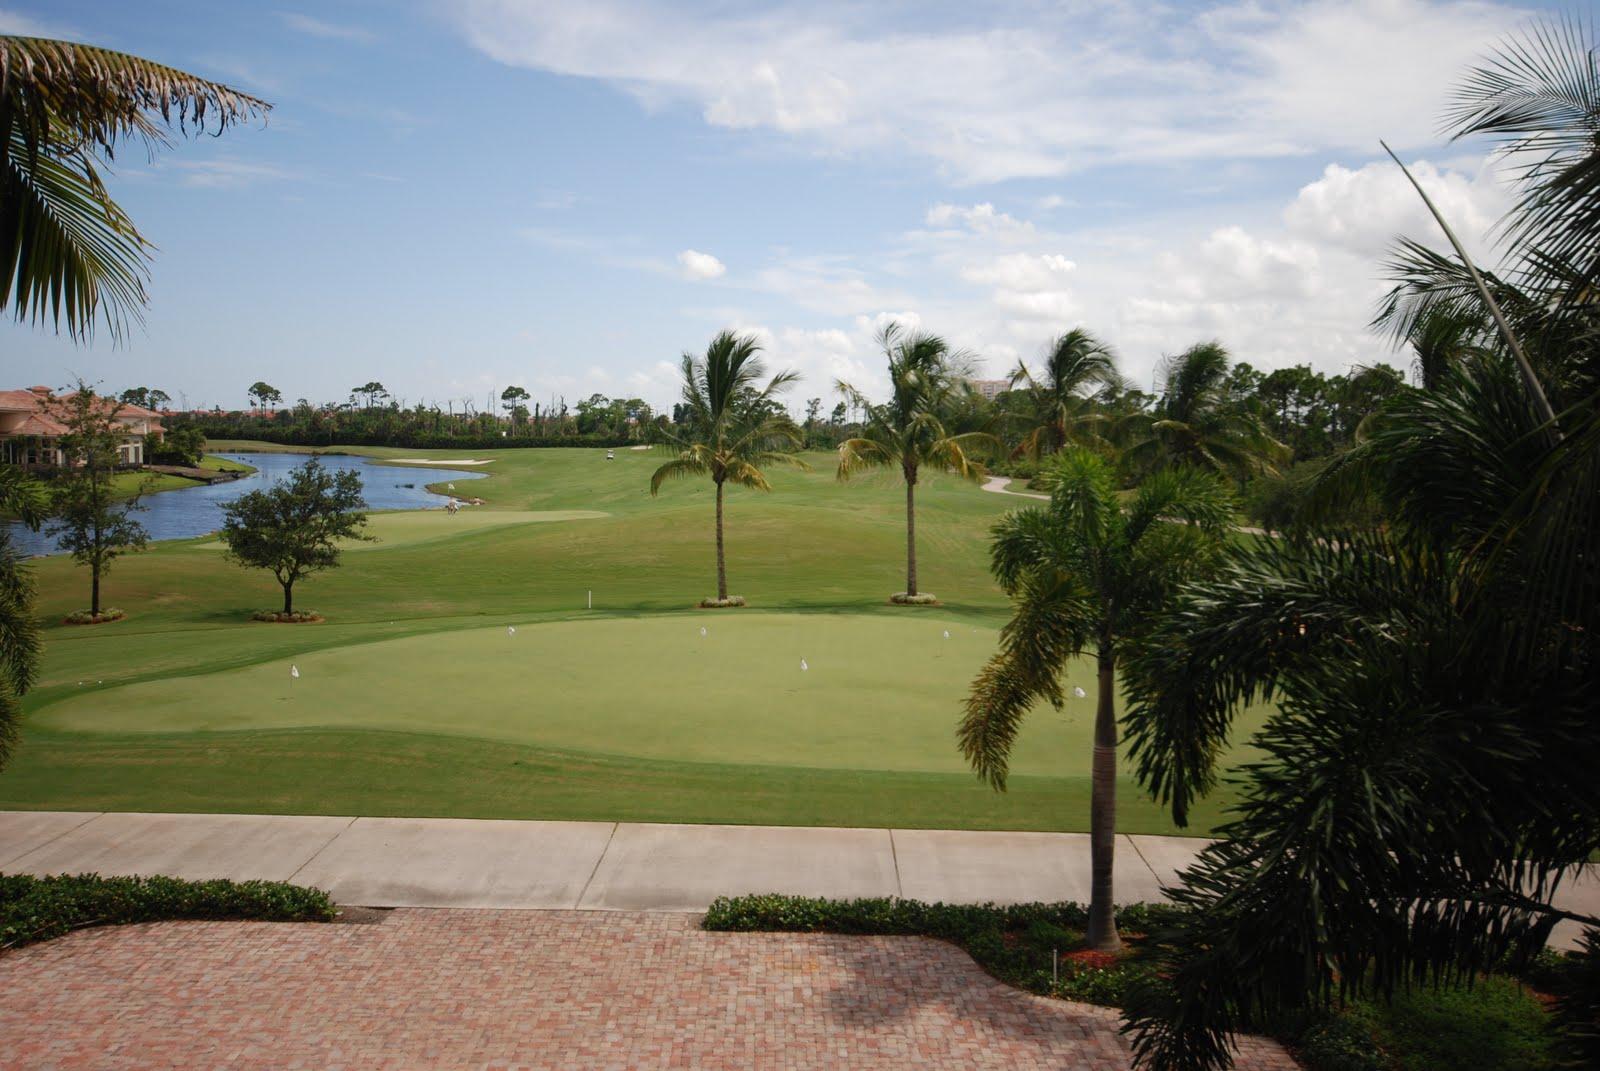 Palm beach gardens golf course homes frenchman 39 s reserve homes for sale for Palm beach gardens golf course